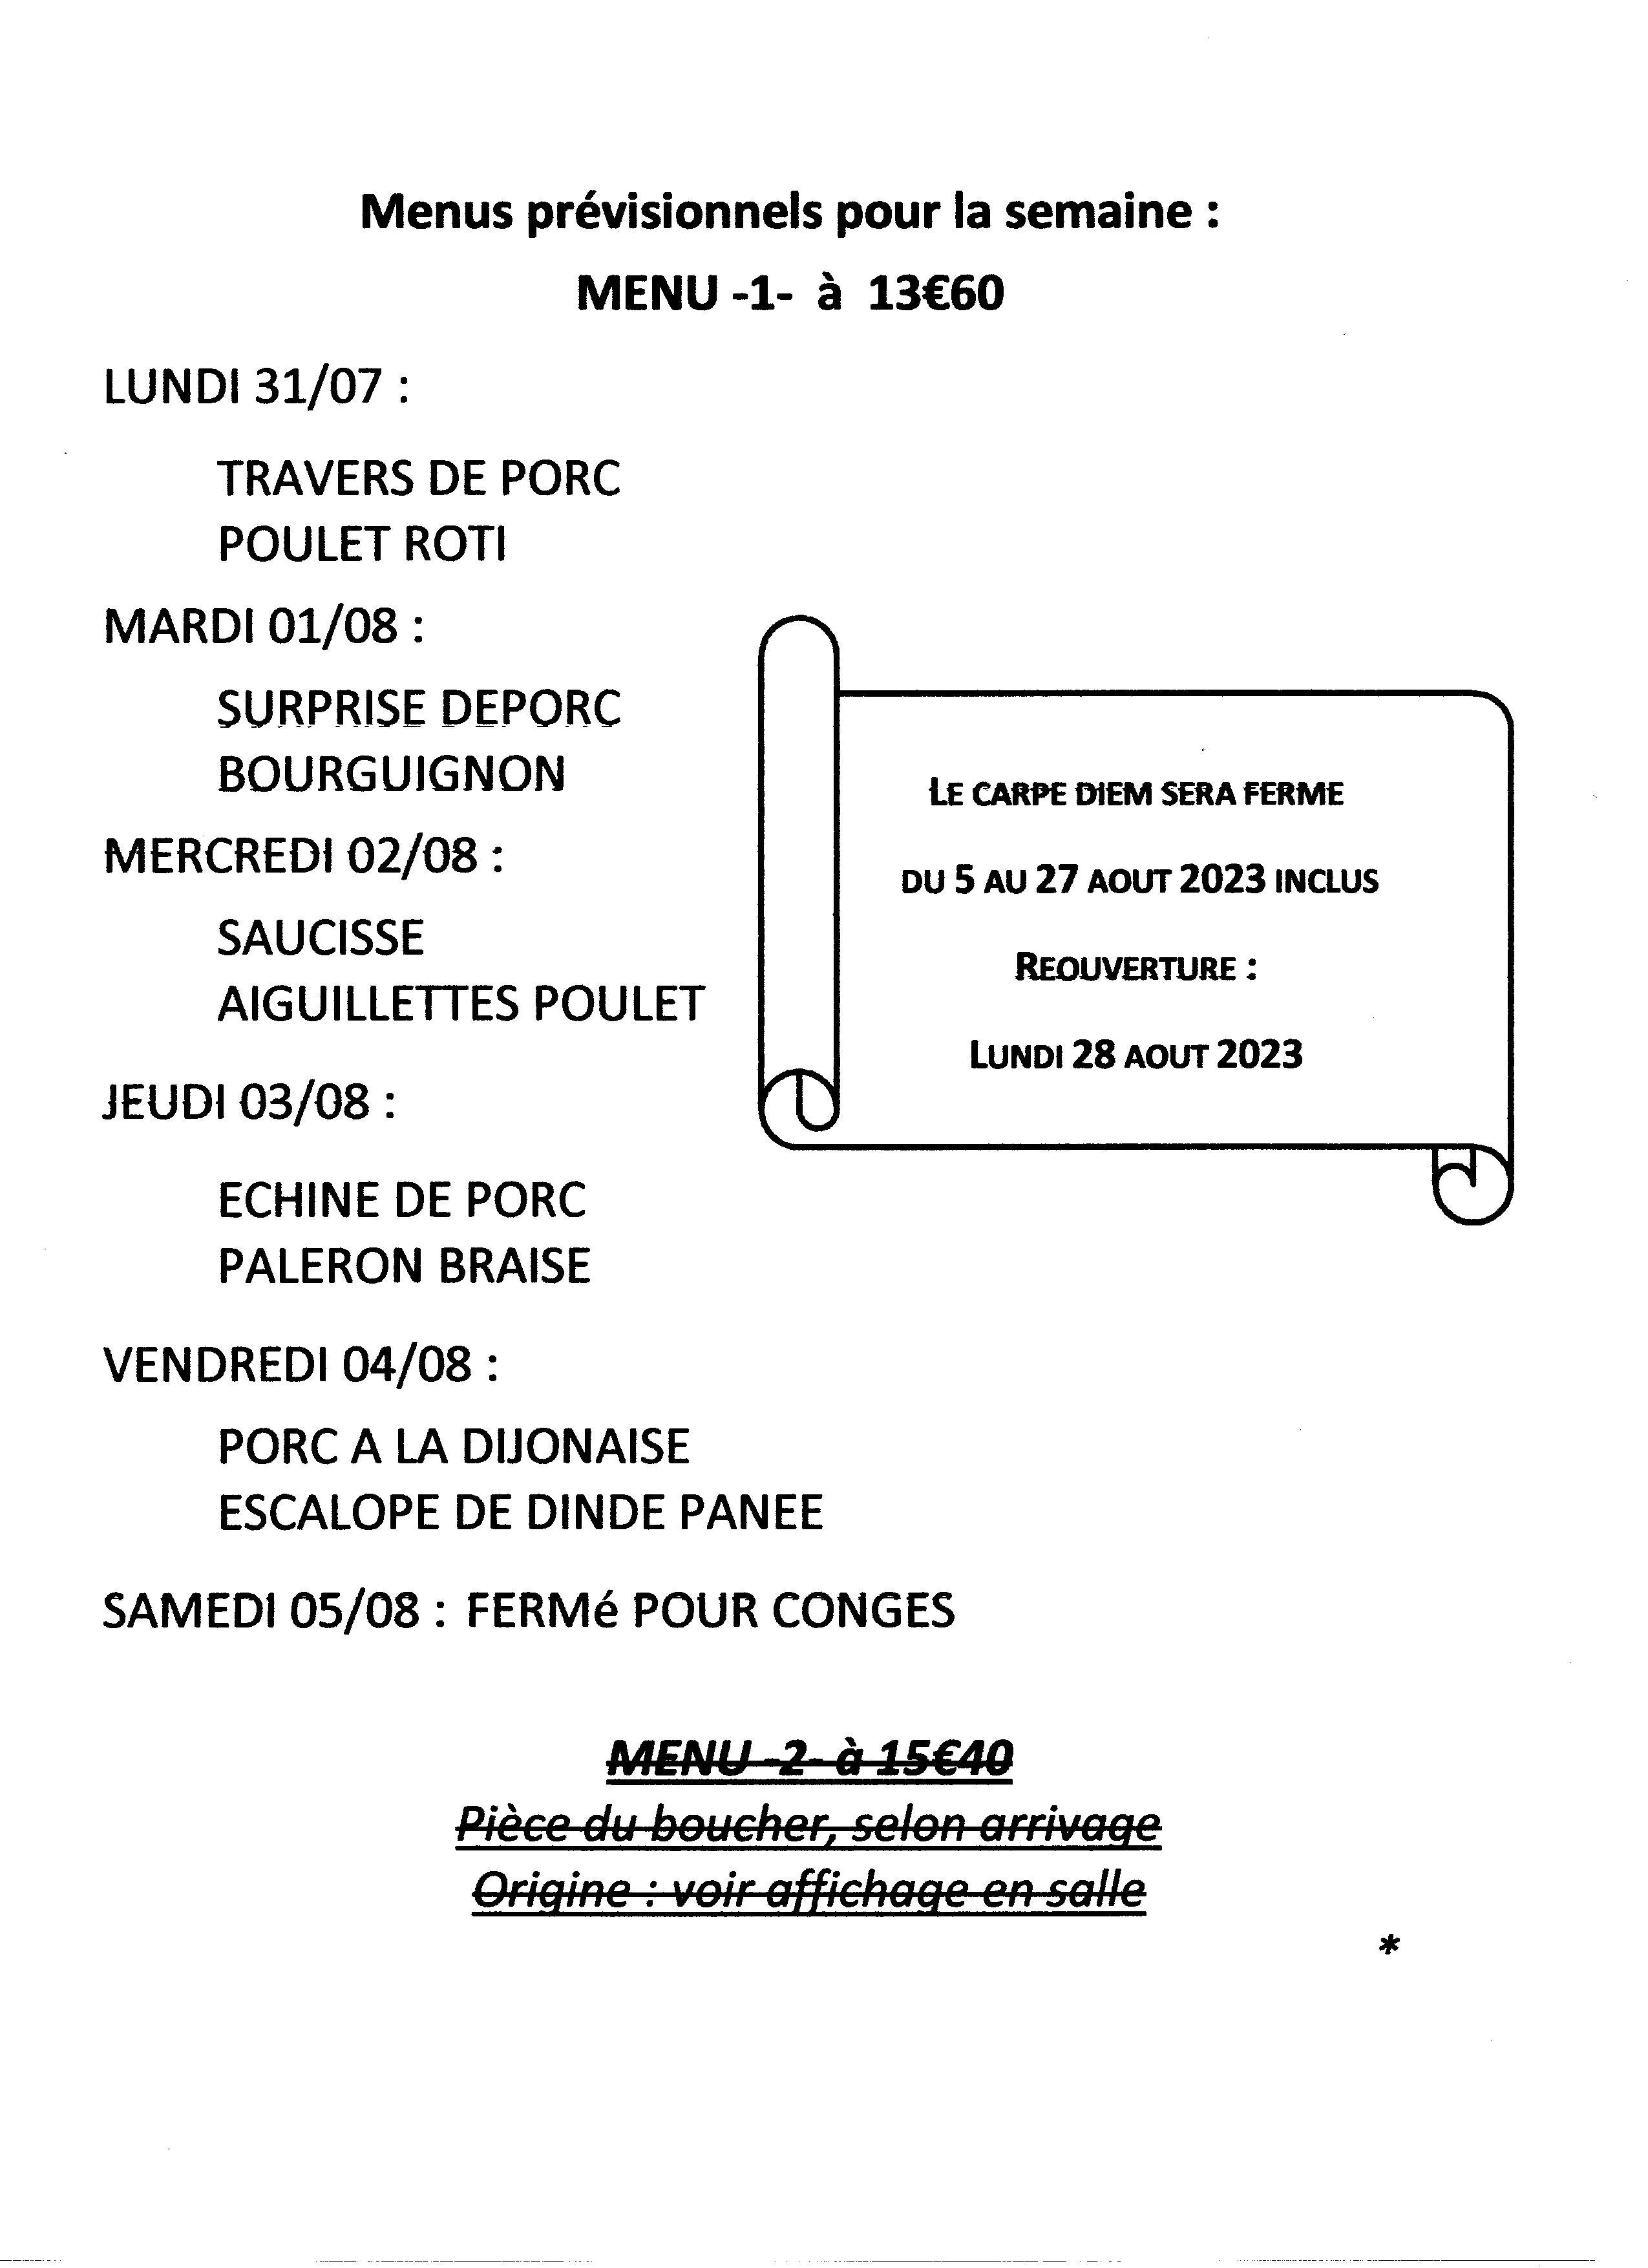 menu_de_la_semaine